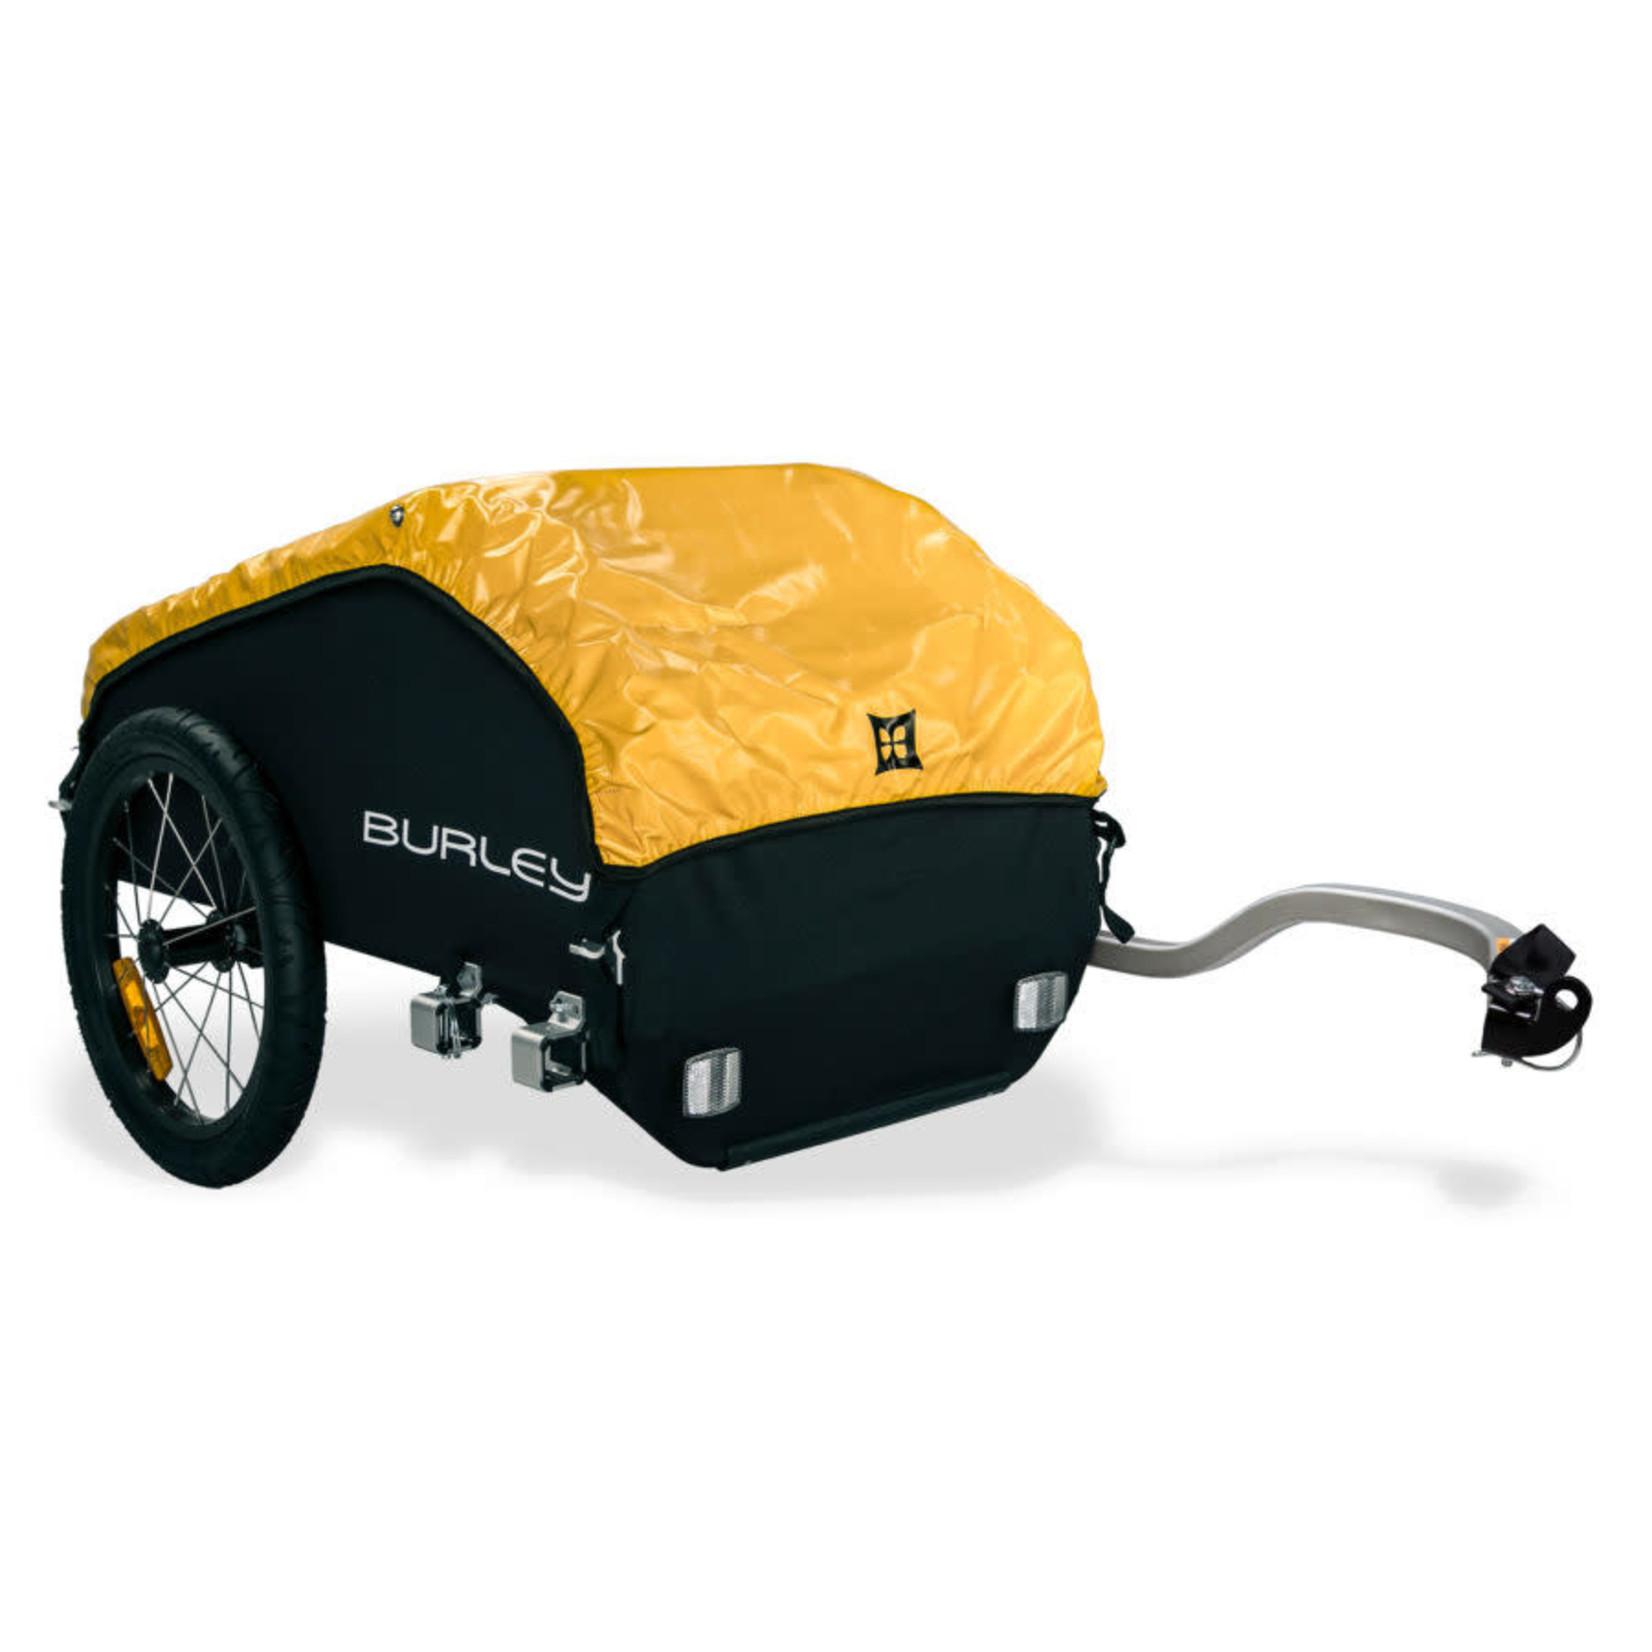 Burley Nomad - Lightweight Bike Cargo Trailer